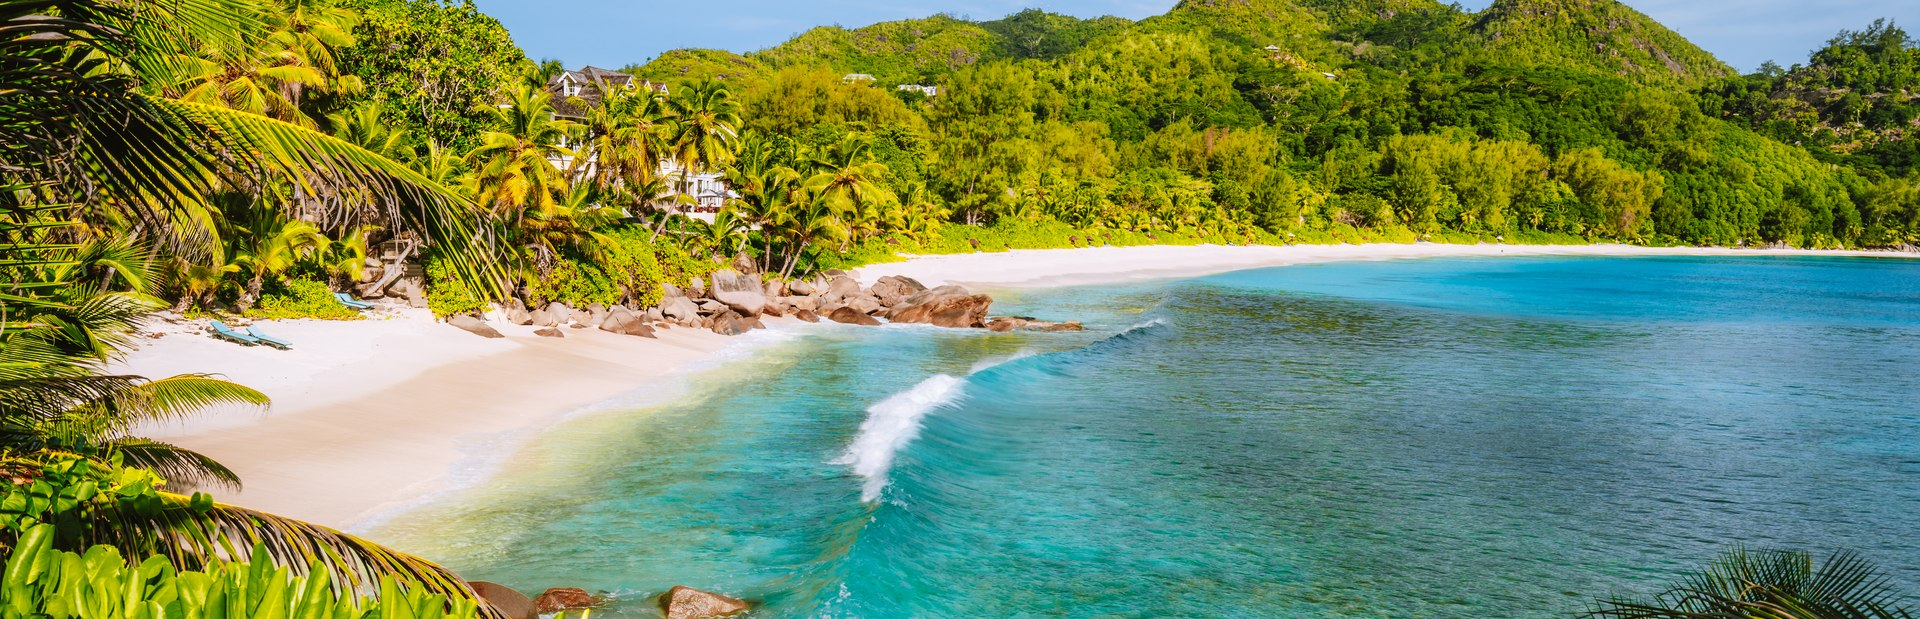 Seychelles climate photo